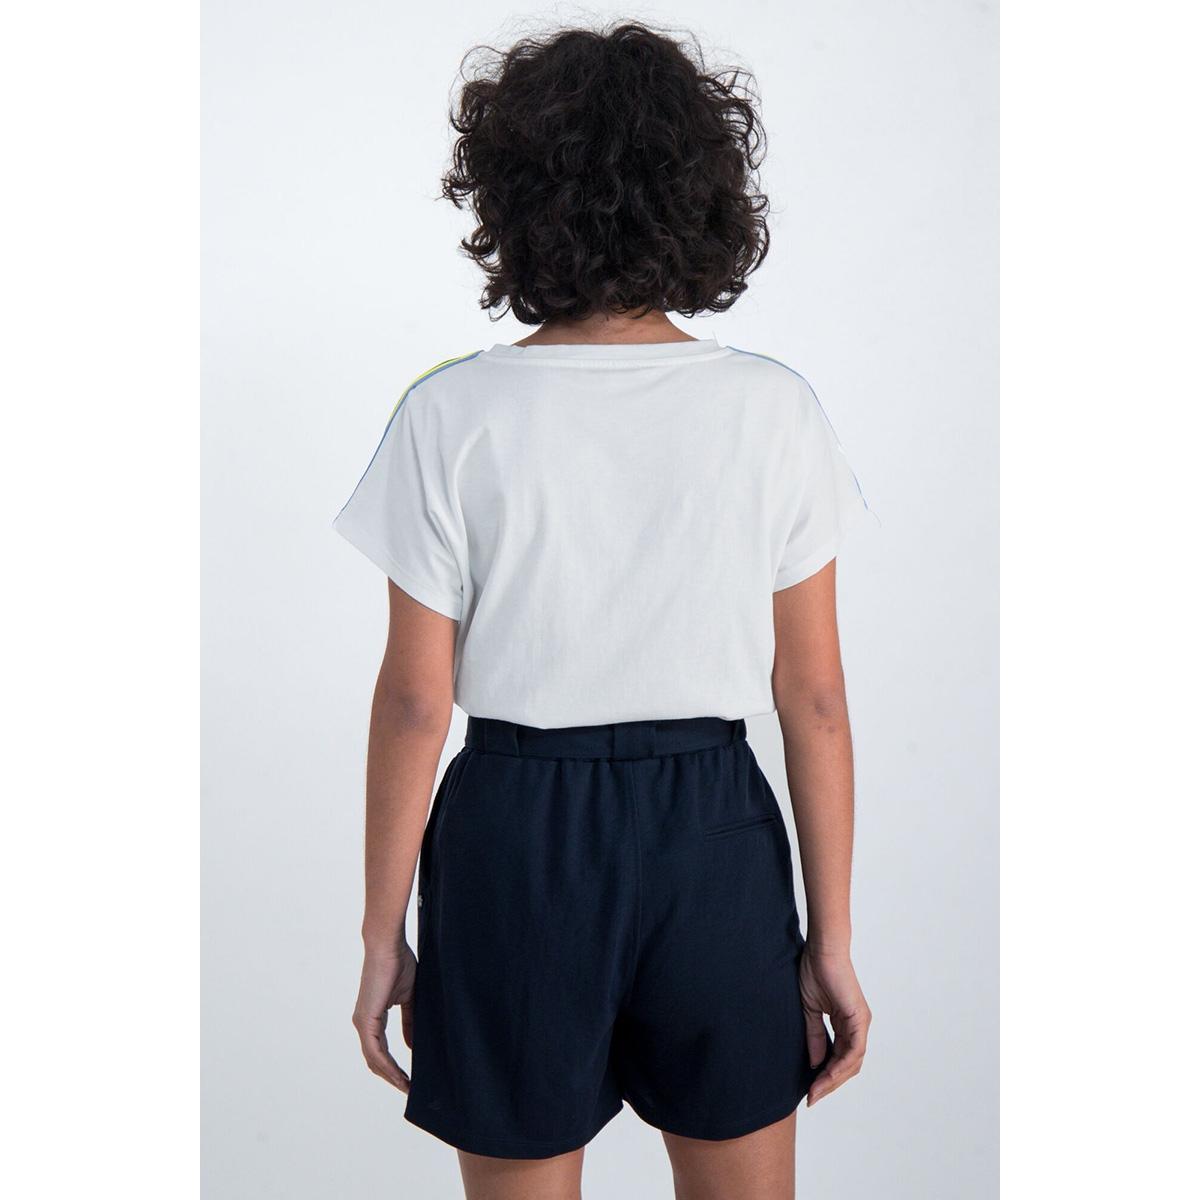 t shirt met glitter tekst print o00007 garcia t-shirt 53 off white